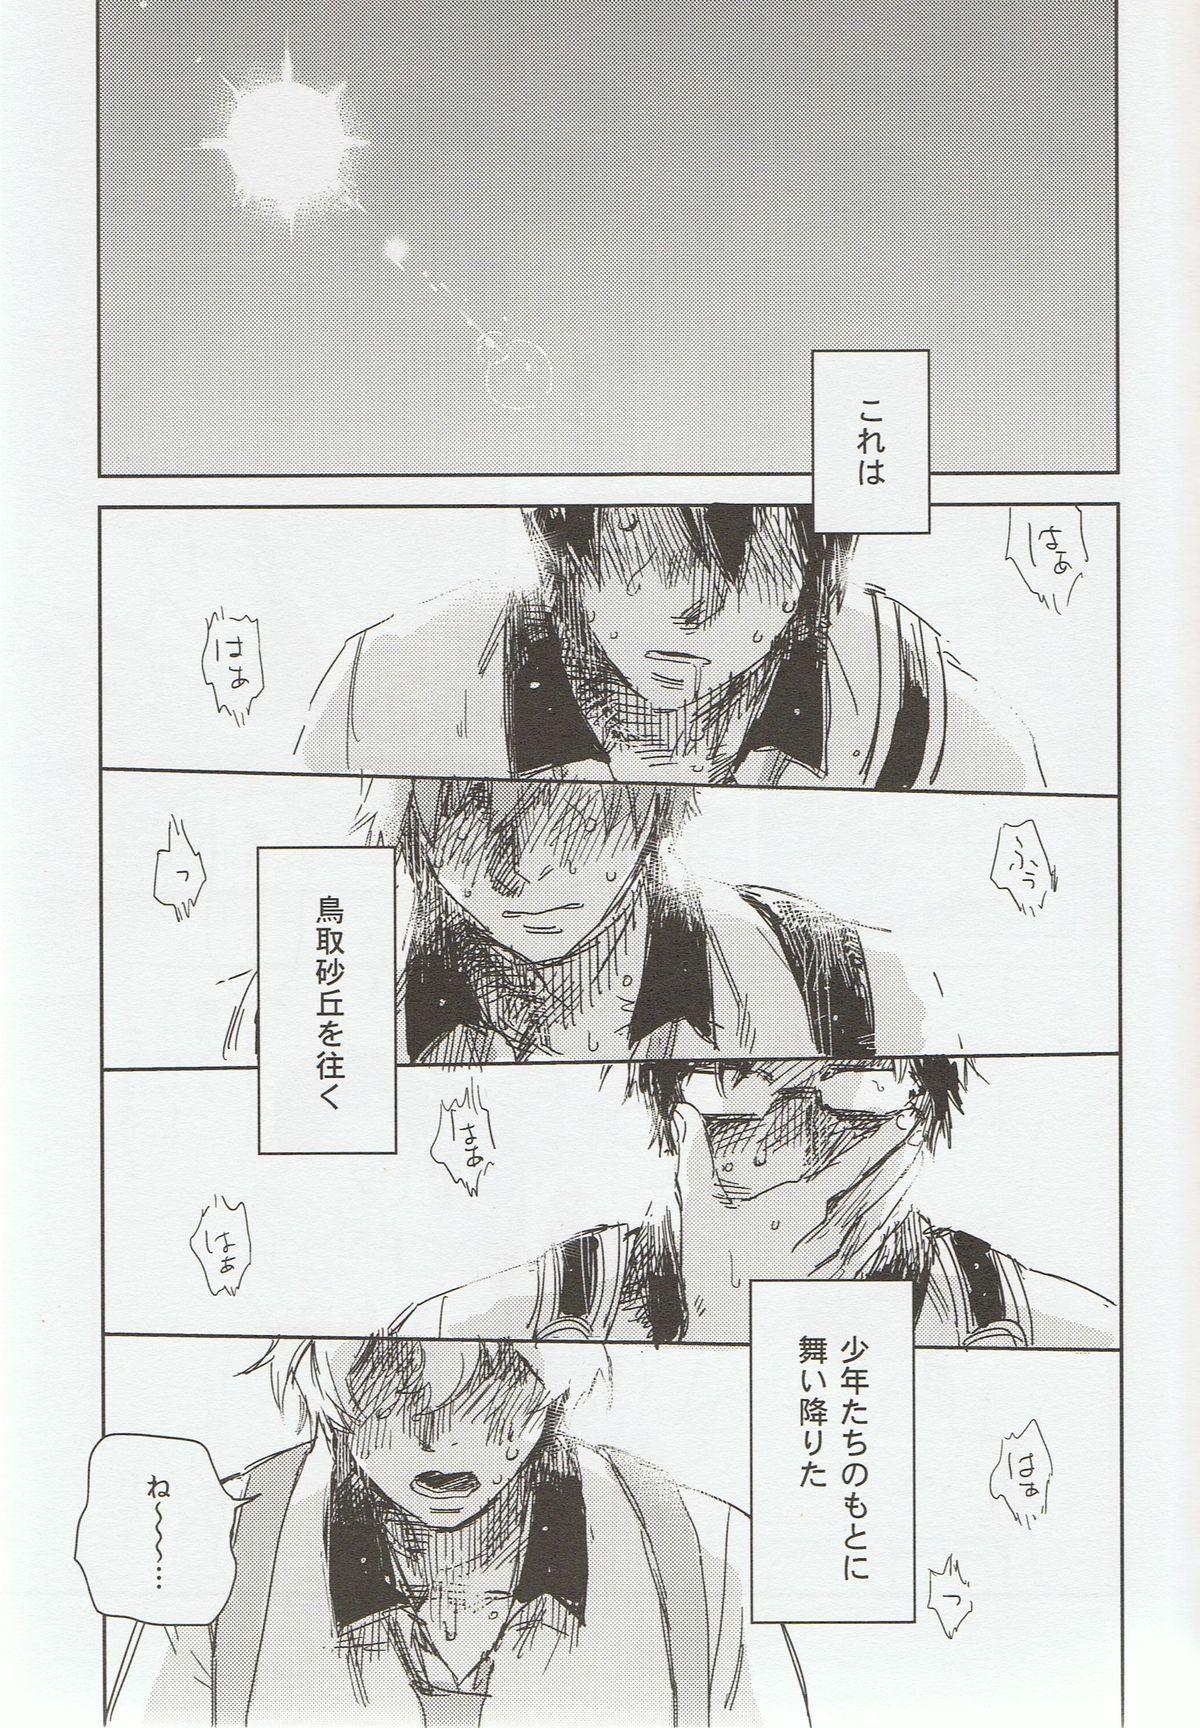 Sou da, Tottori Sakyuu Ikou. 3